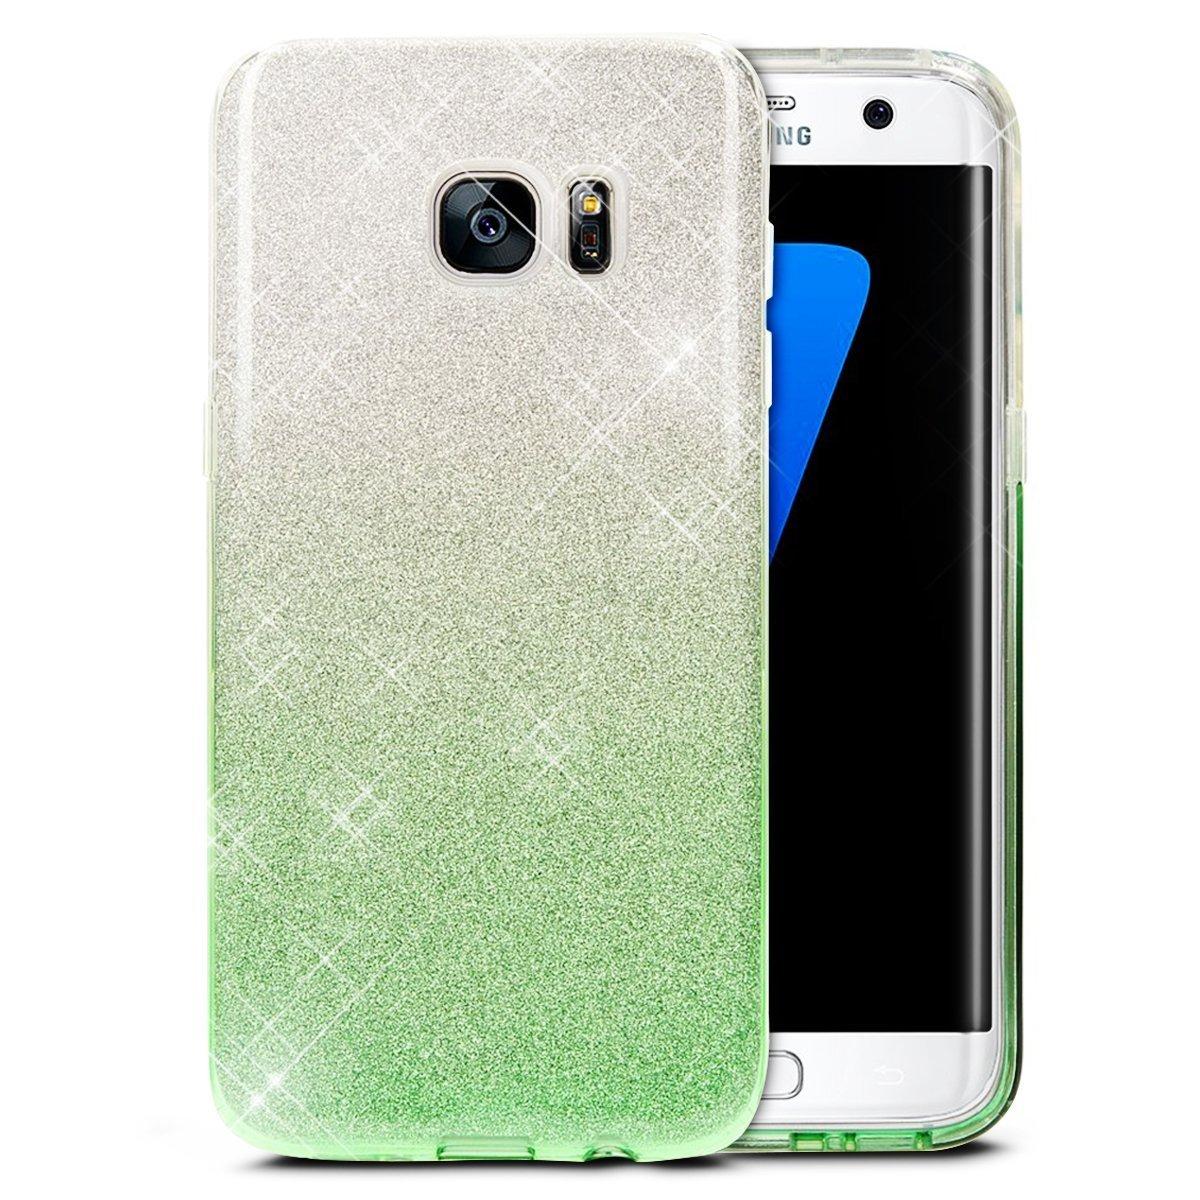 JAWSEU Coque Etui Samsung Galaxy S6, Placage Miroir Coque Folio en Cuir É tui de Protection Luxe Mode Effet Miroir Motif Coque Ultra Mince Leather PU Portefeuille Flip per Samsung Galaxy S6 JAWSEU0057028